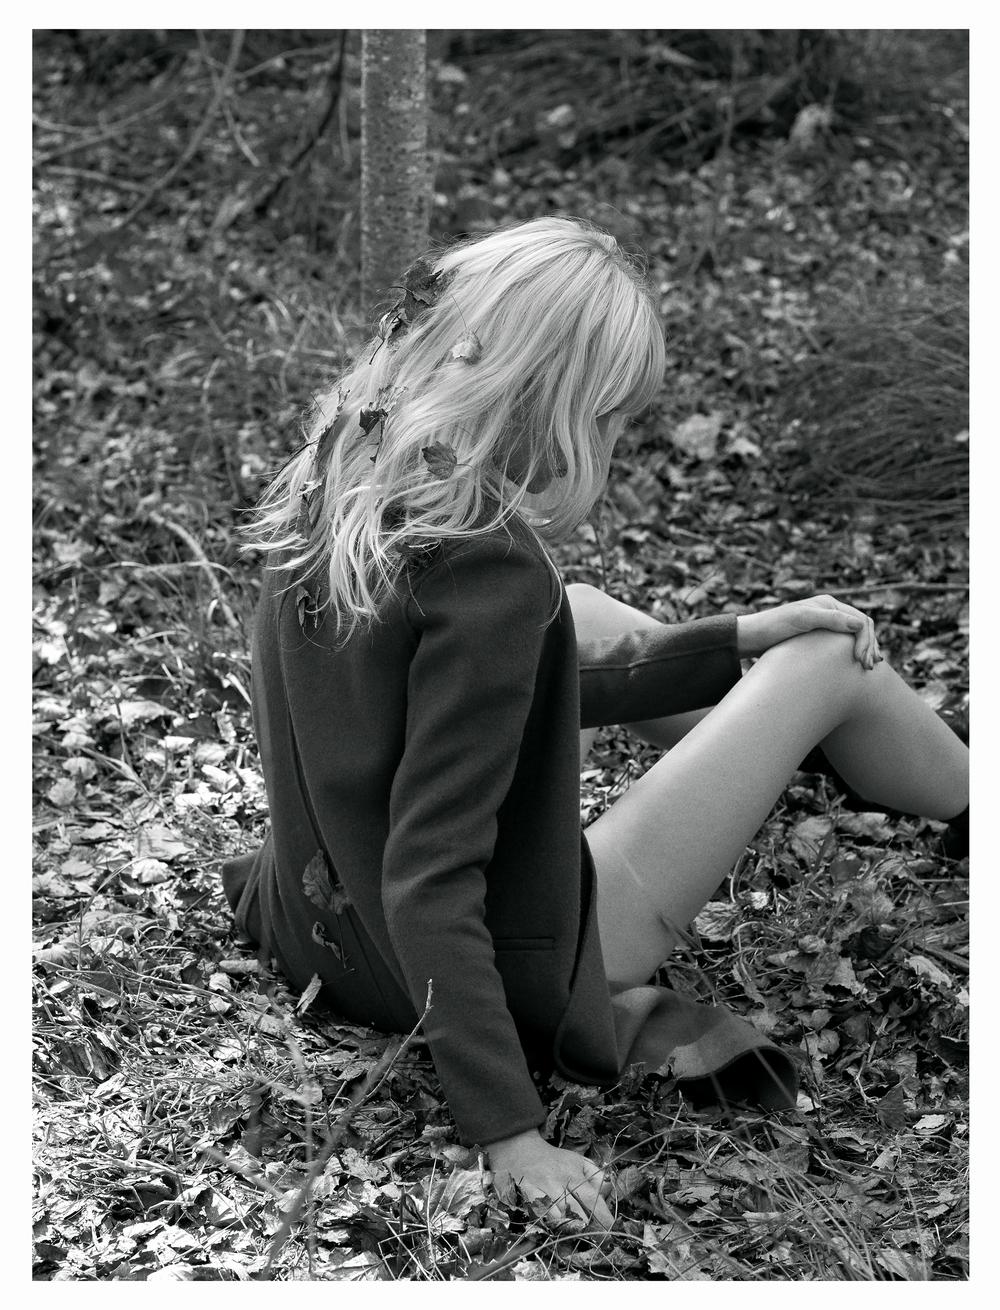 Elle_June'16_WebsiteLayout_Single_02.jpg